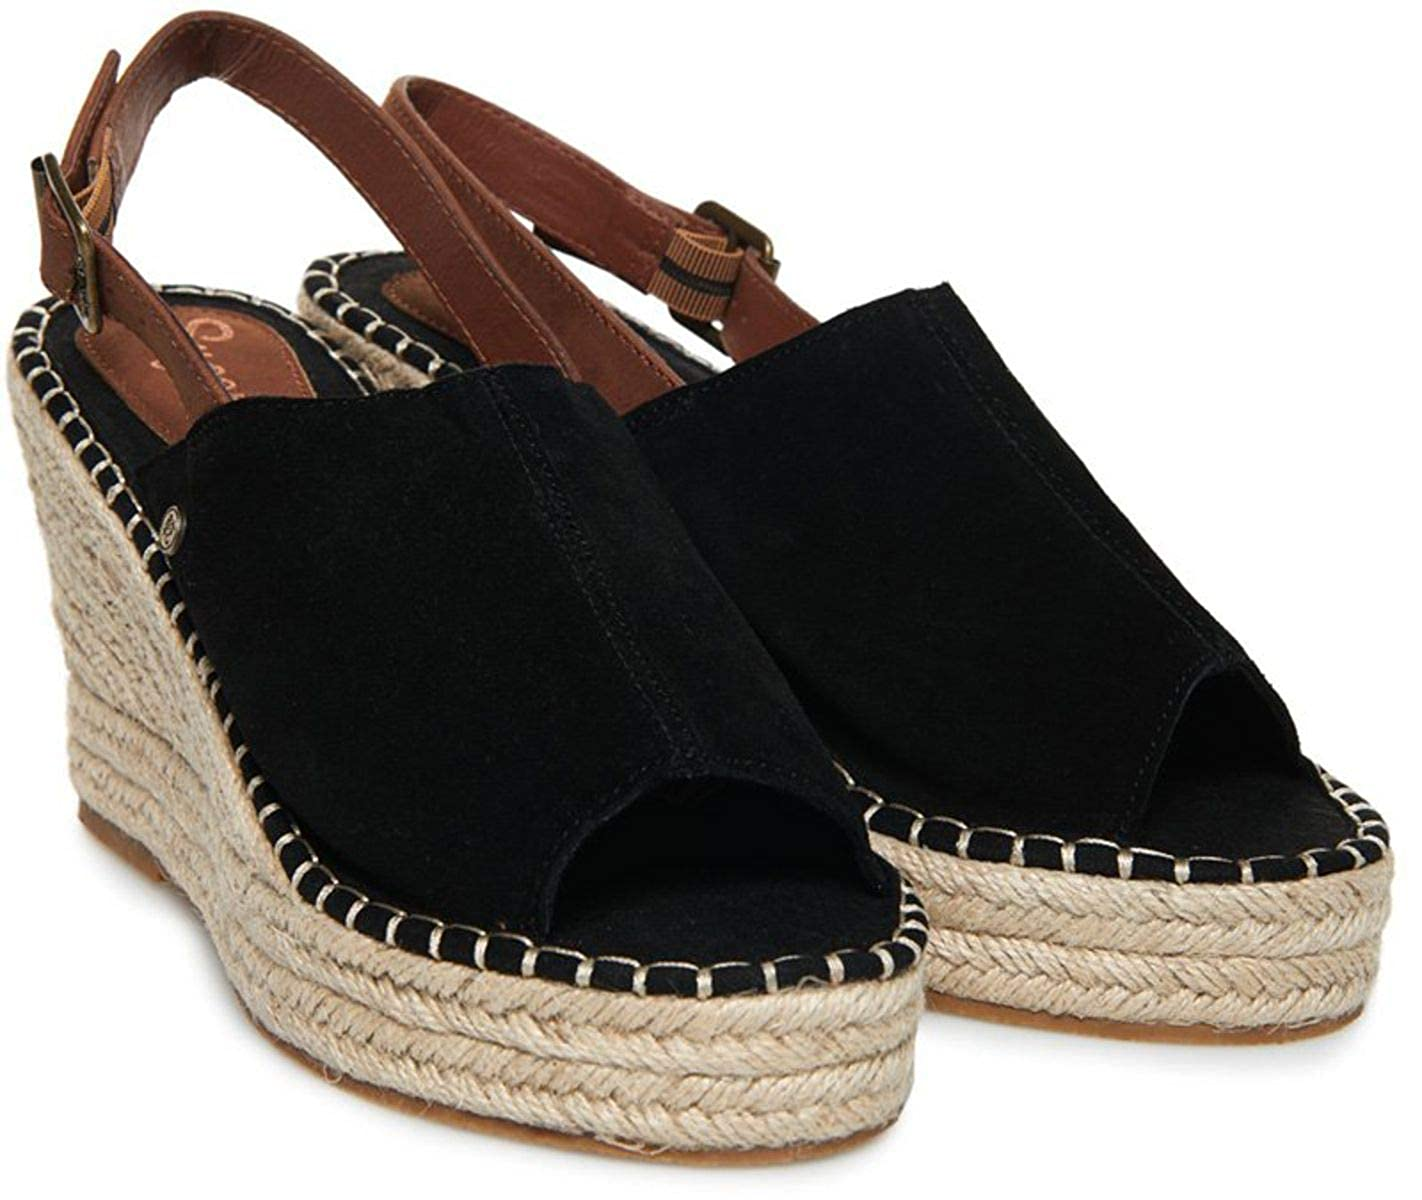 Superdry Grace Wedge Espadrilles Shoes